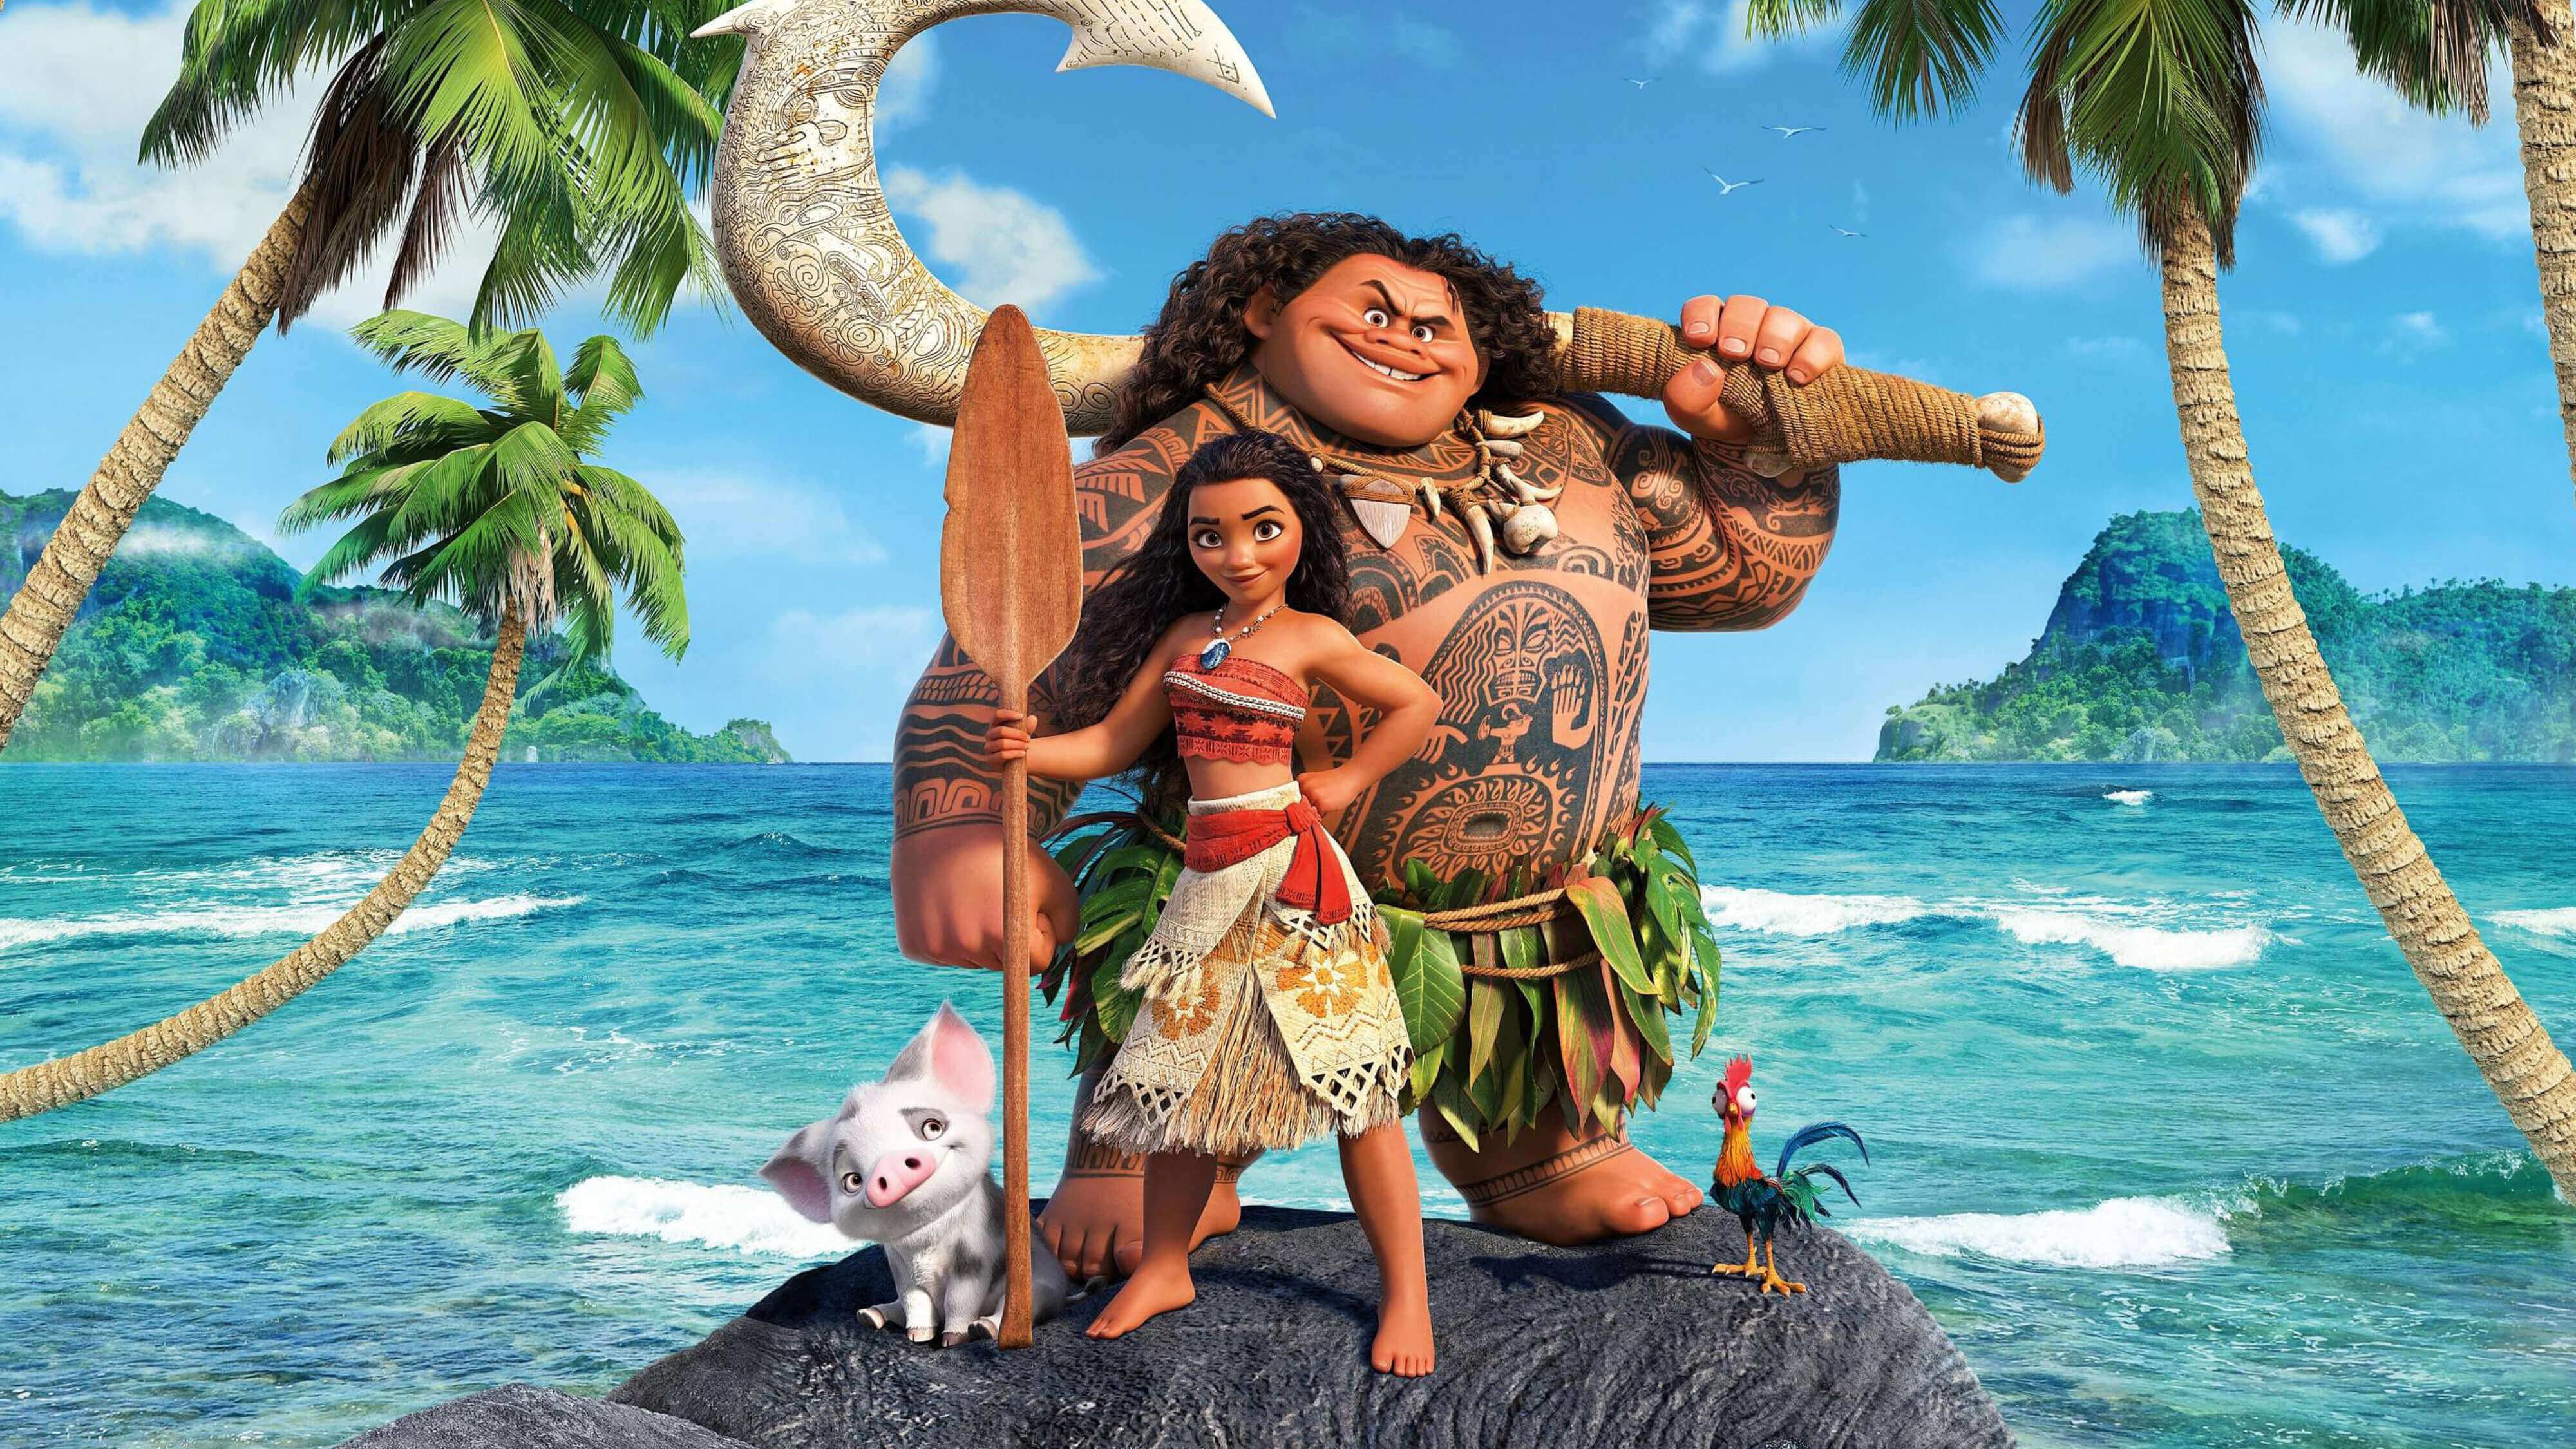 Oceania luoghi paradisiaci da visitare insieme a